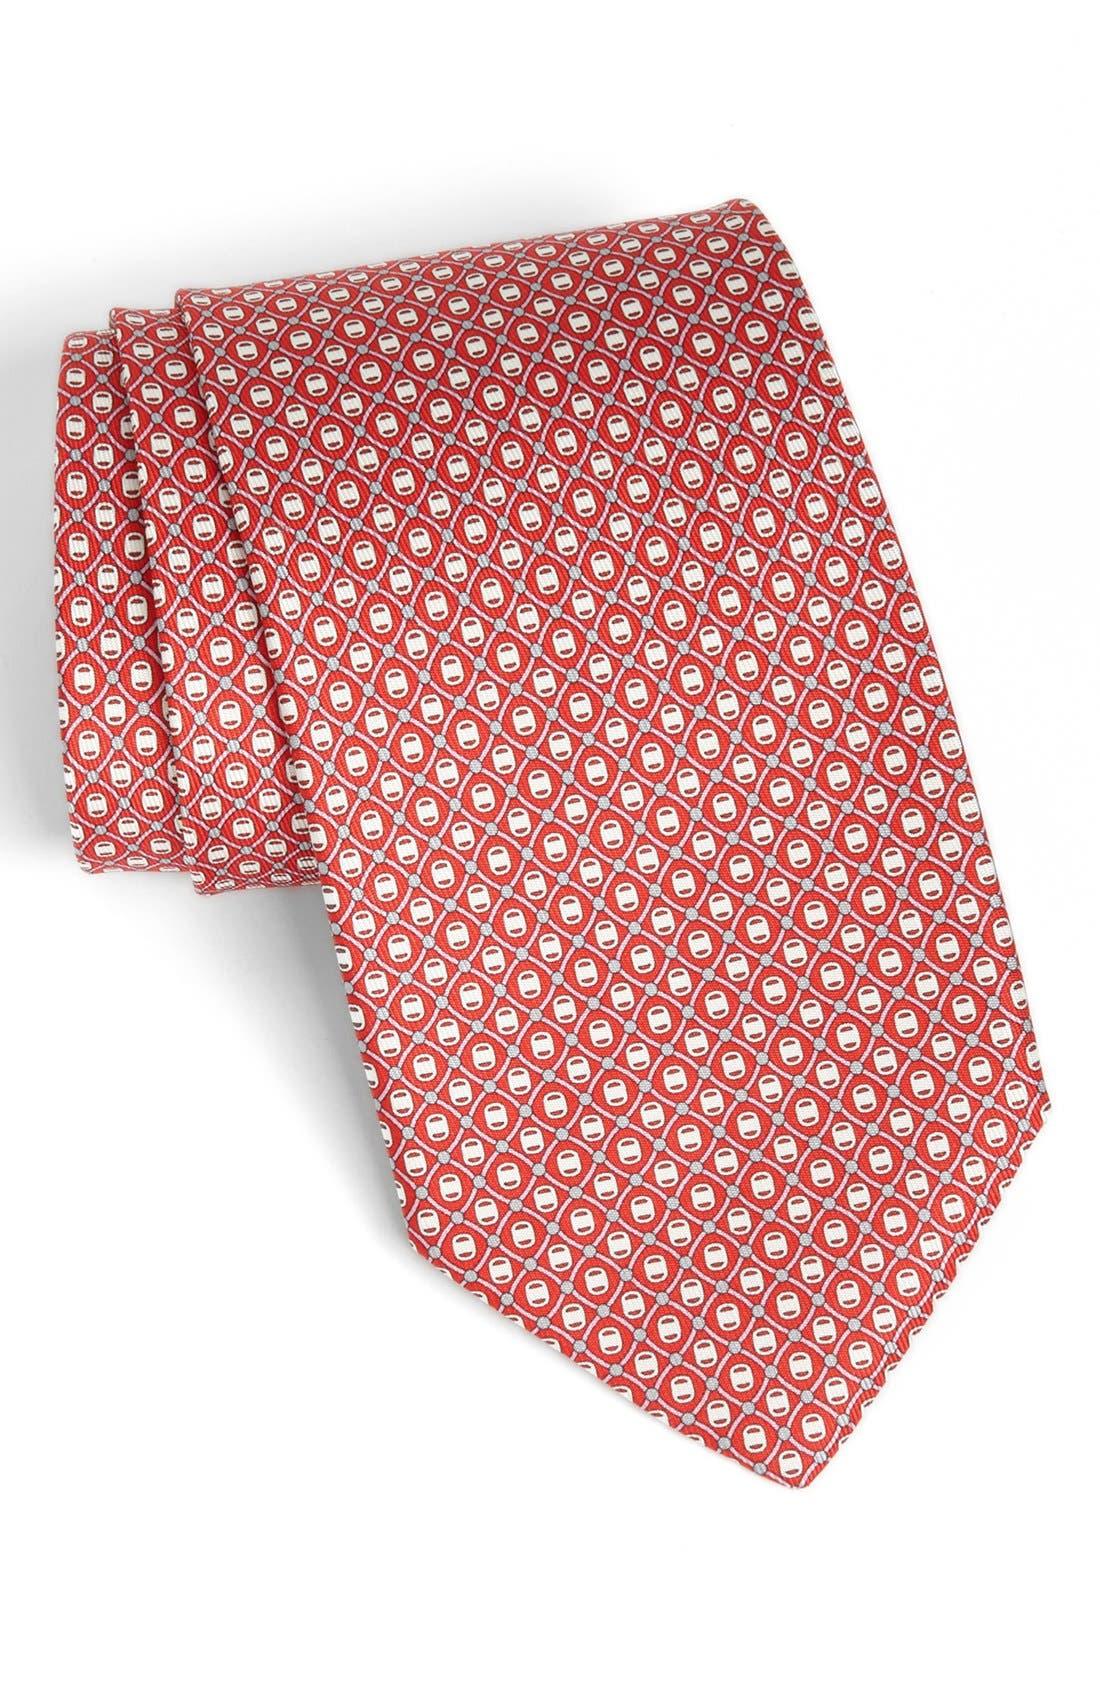 Alternate Image 1 Selected - Salvatore Ferragamo Grid Print Silk Tie